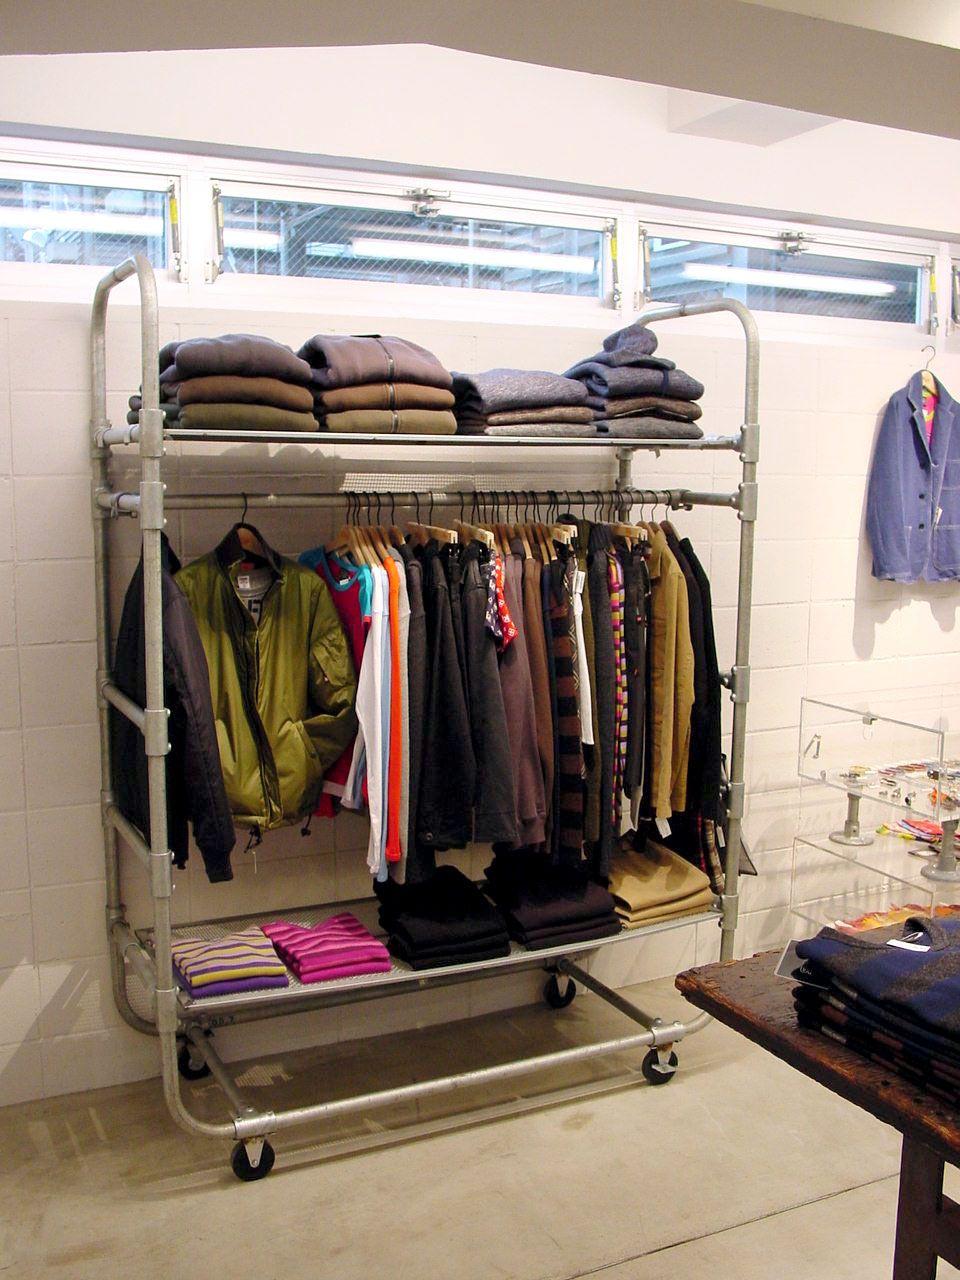 39 Diy Retail Display Ideas From Clothing Racks To Signage Simplified Buildingrssfacebooktwitteryoutubelinkedininstagr Diy Clothes Rack Rolling Clothes Rack